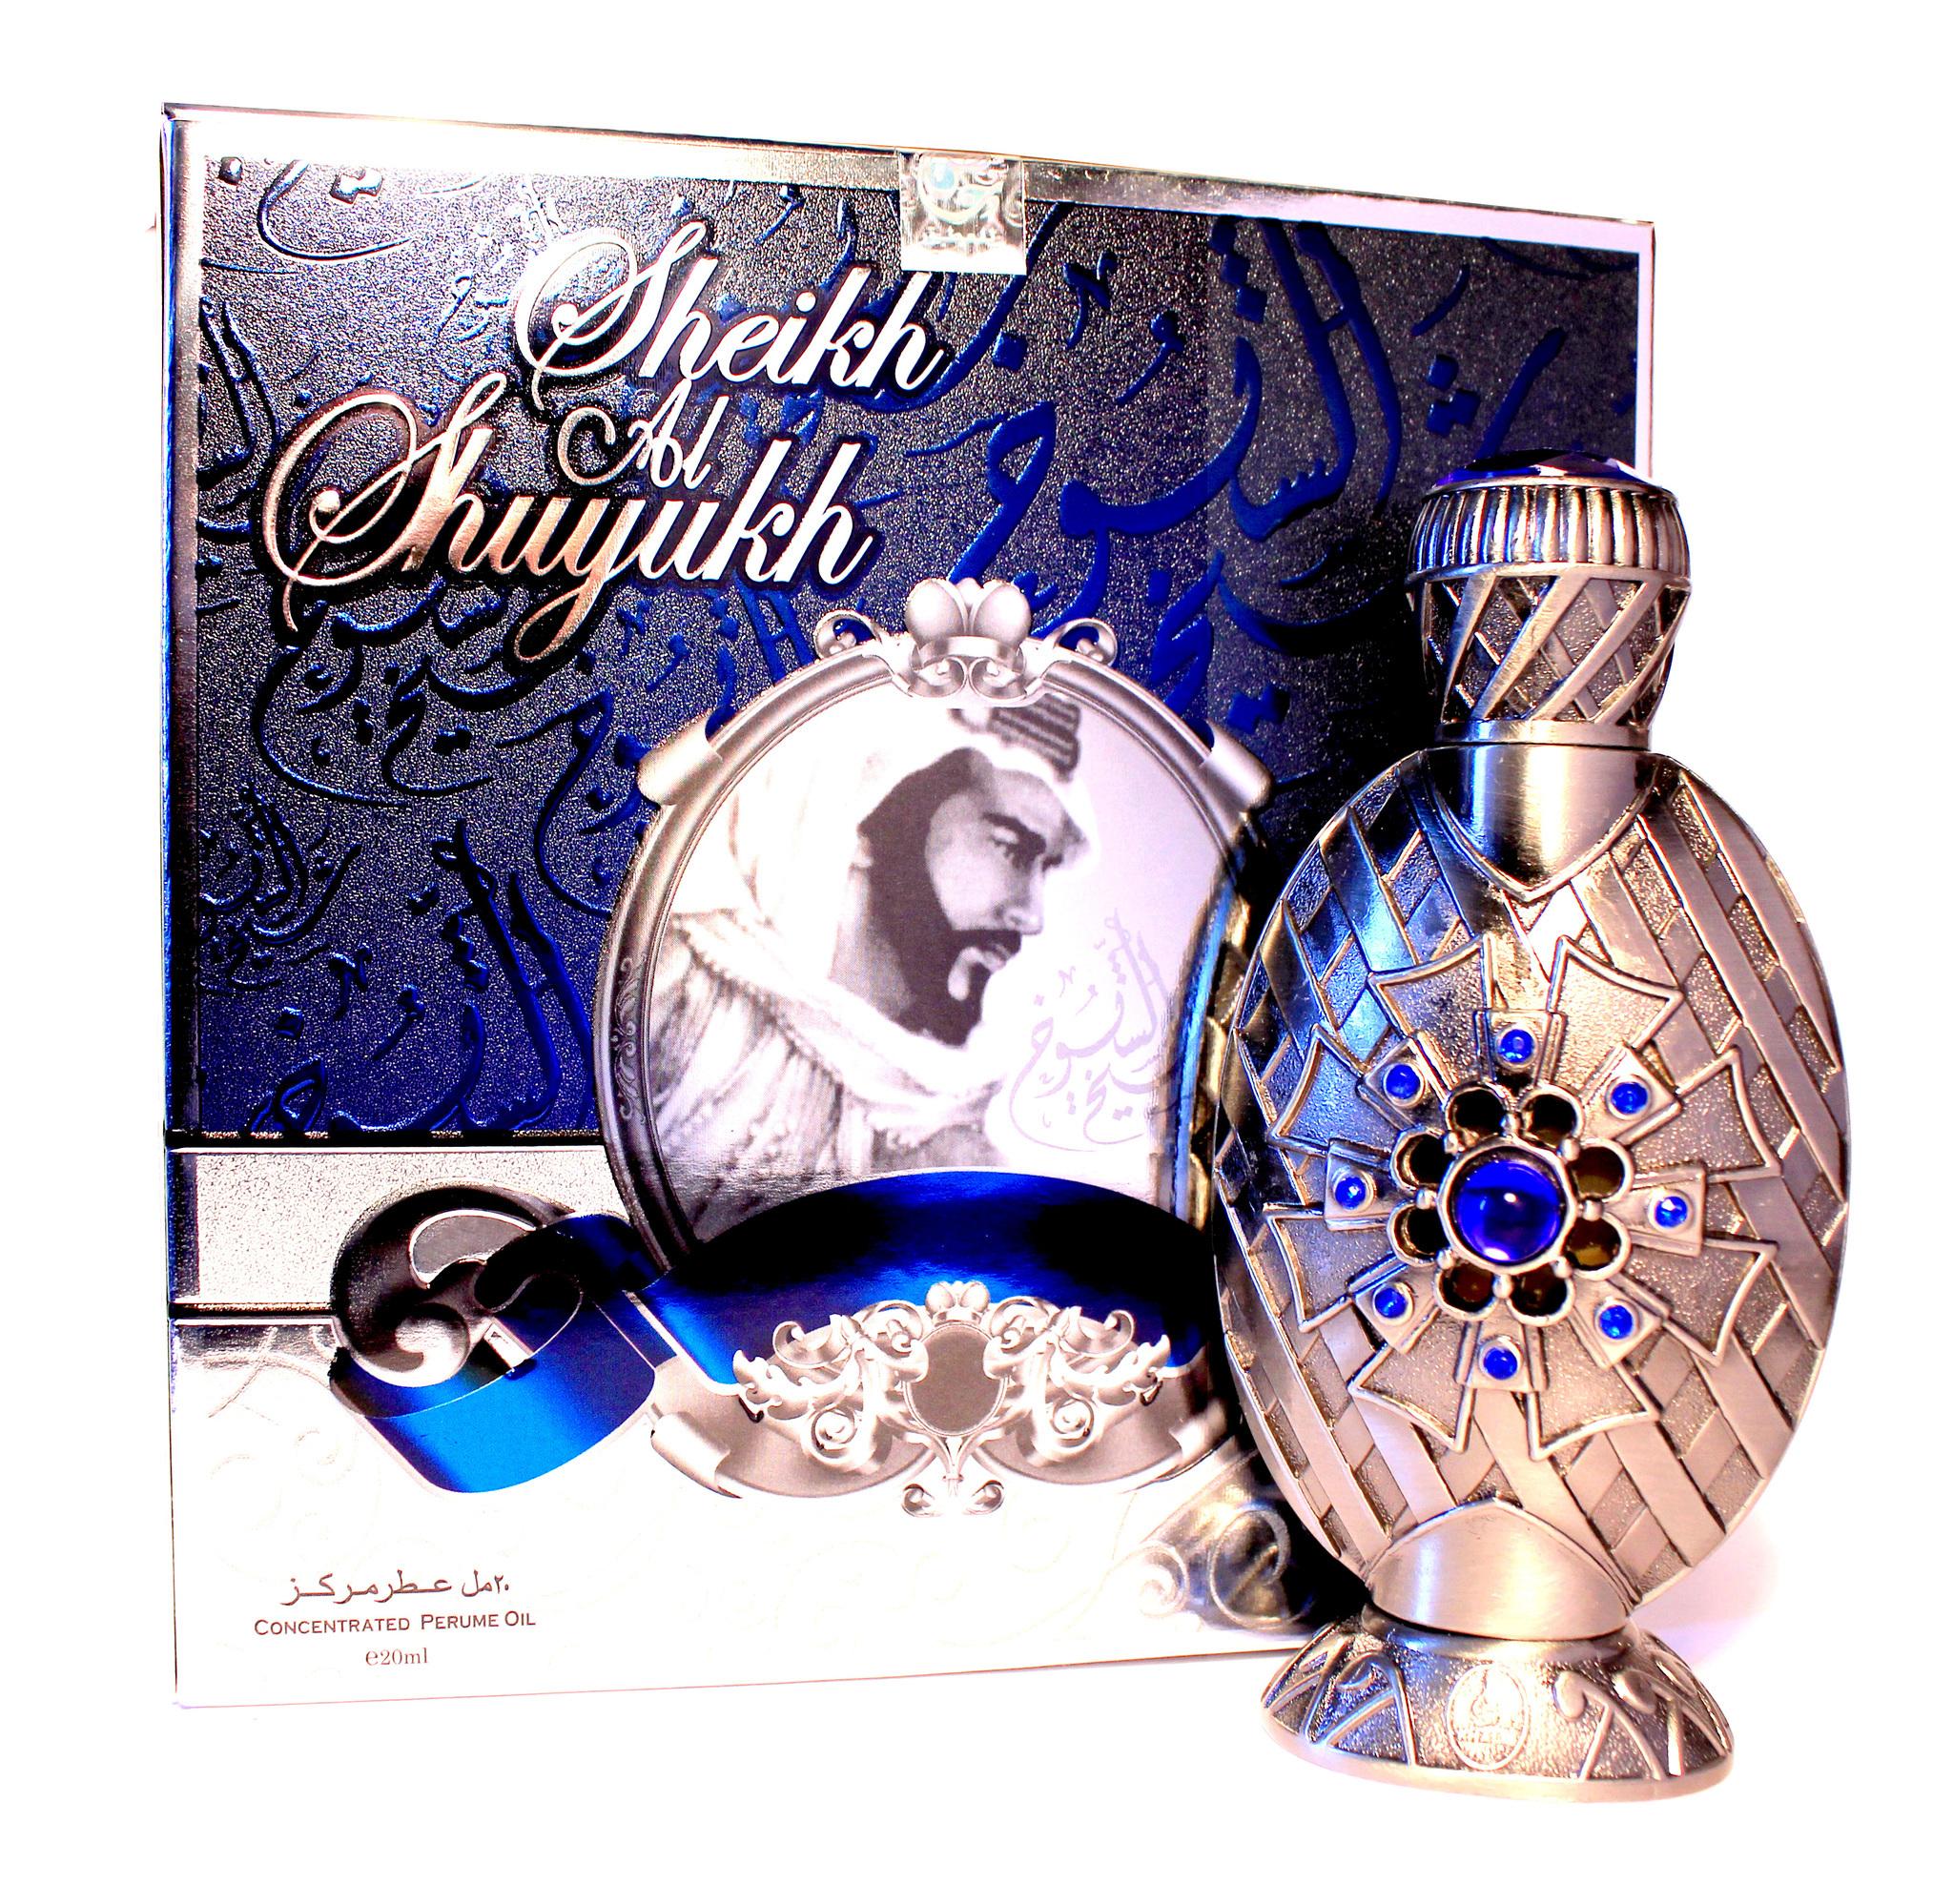 Пробник для Sheik Al Shuyukh Шейх Аль Шуюх 1 мл арабские масляные духи от Халис Khalis Perfumes